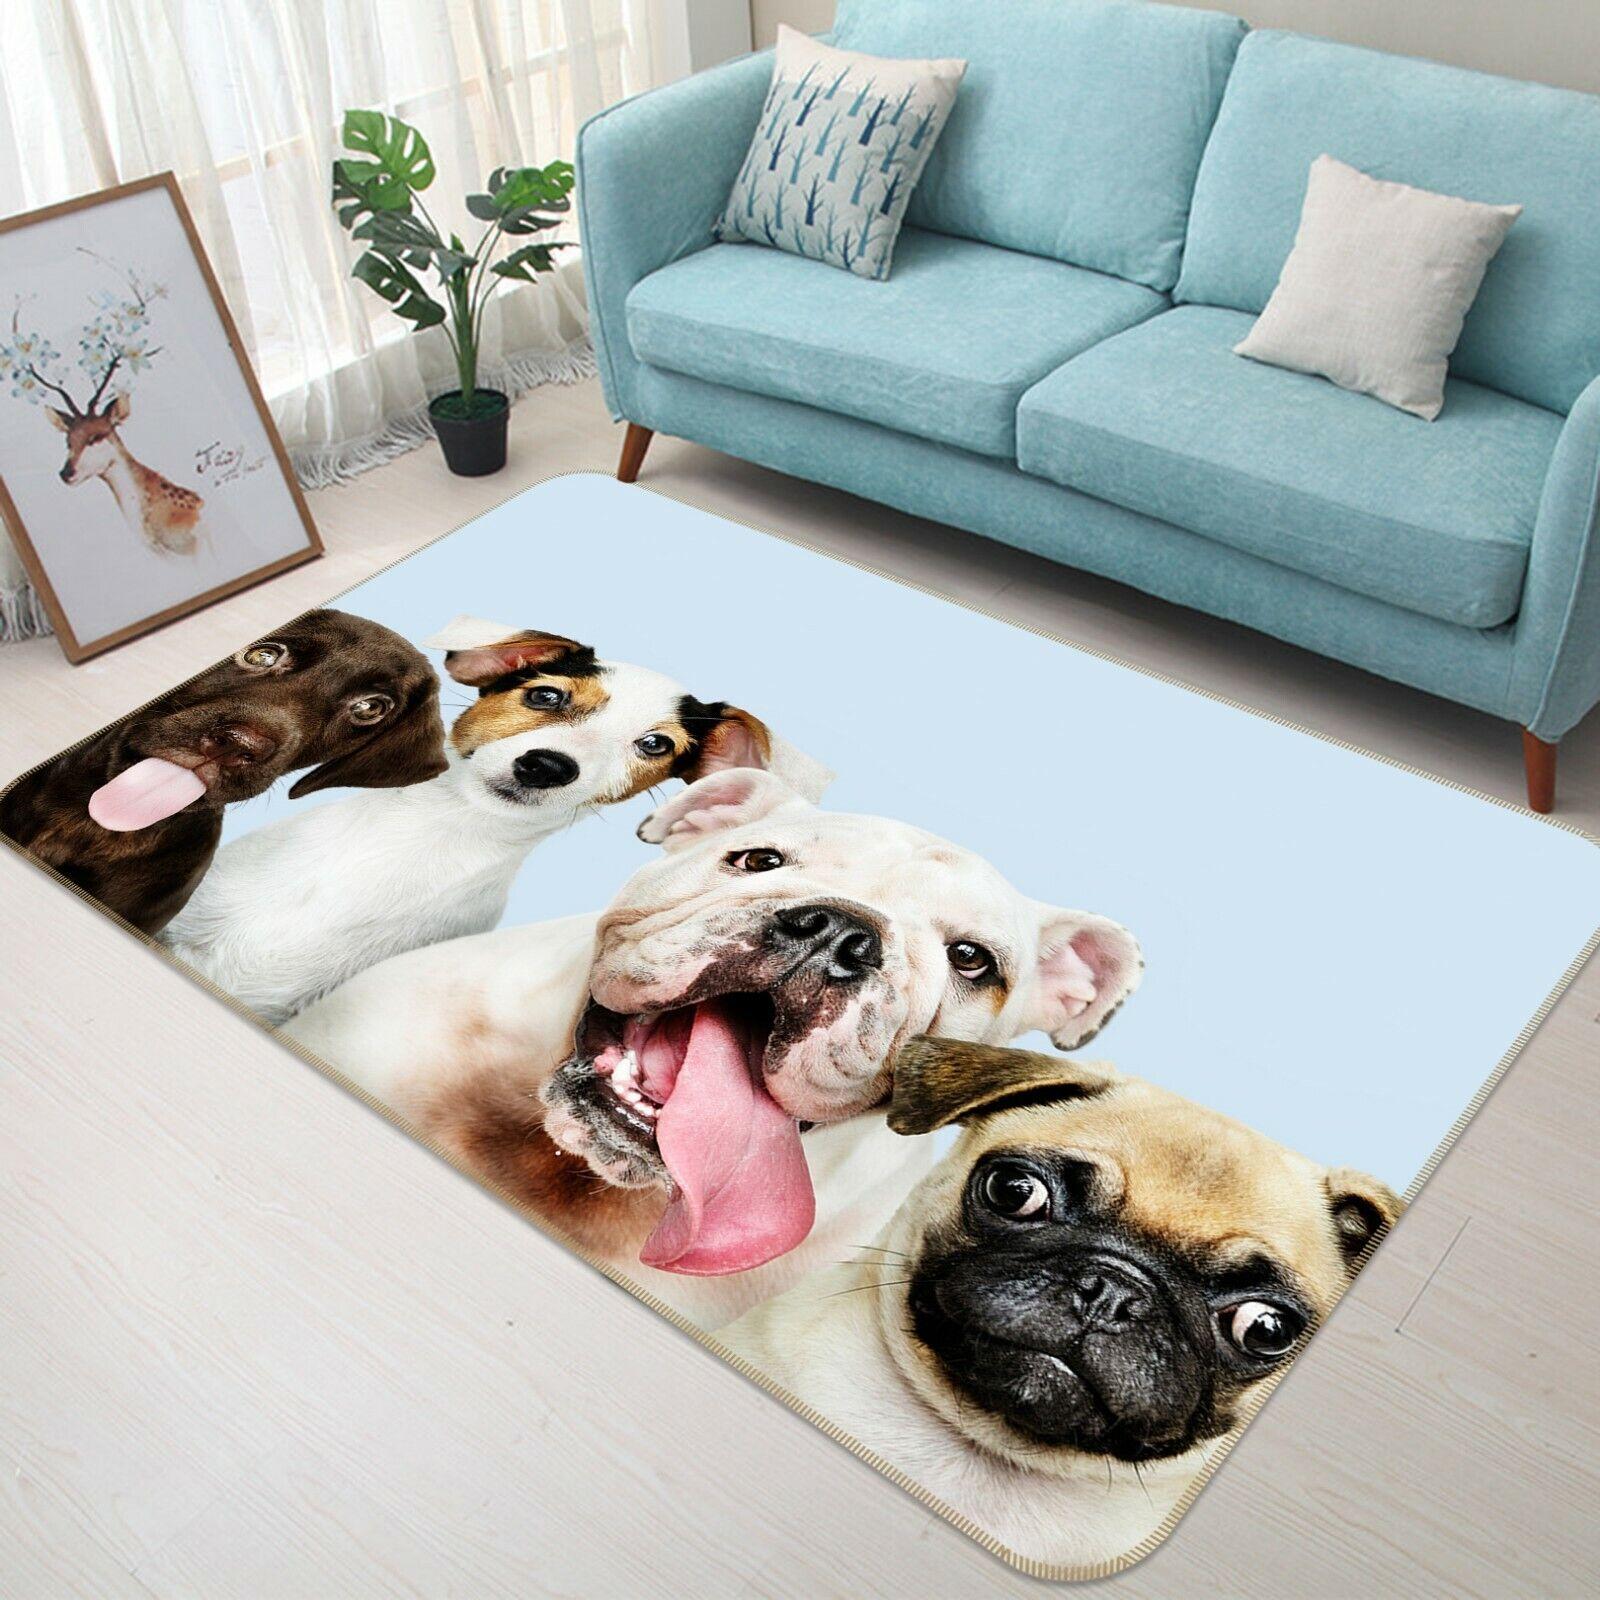 3D Carino Cane C026 Animale tappetino antiscivolo tappeto rossoondo elegante Tappeto Wendy